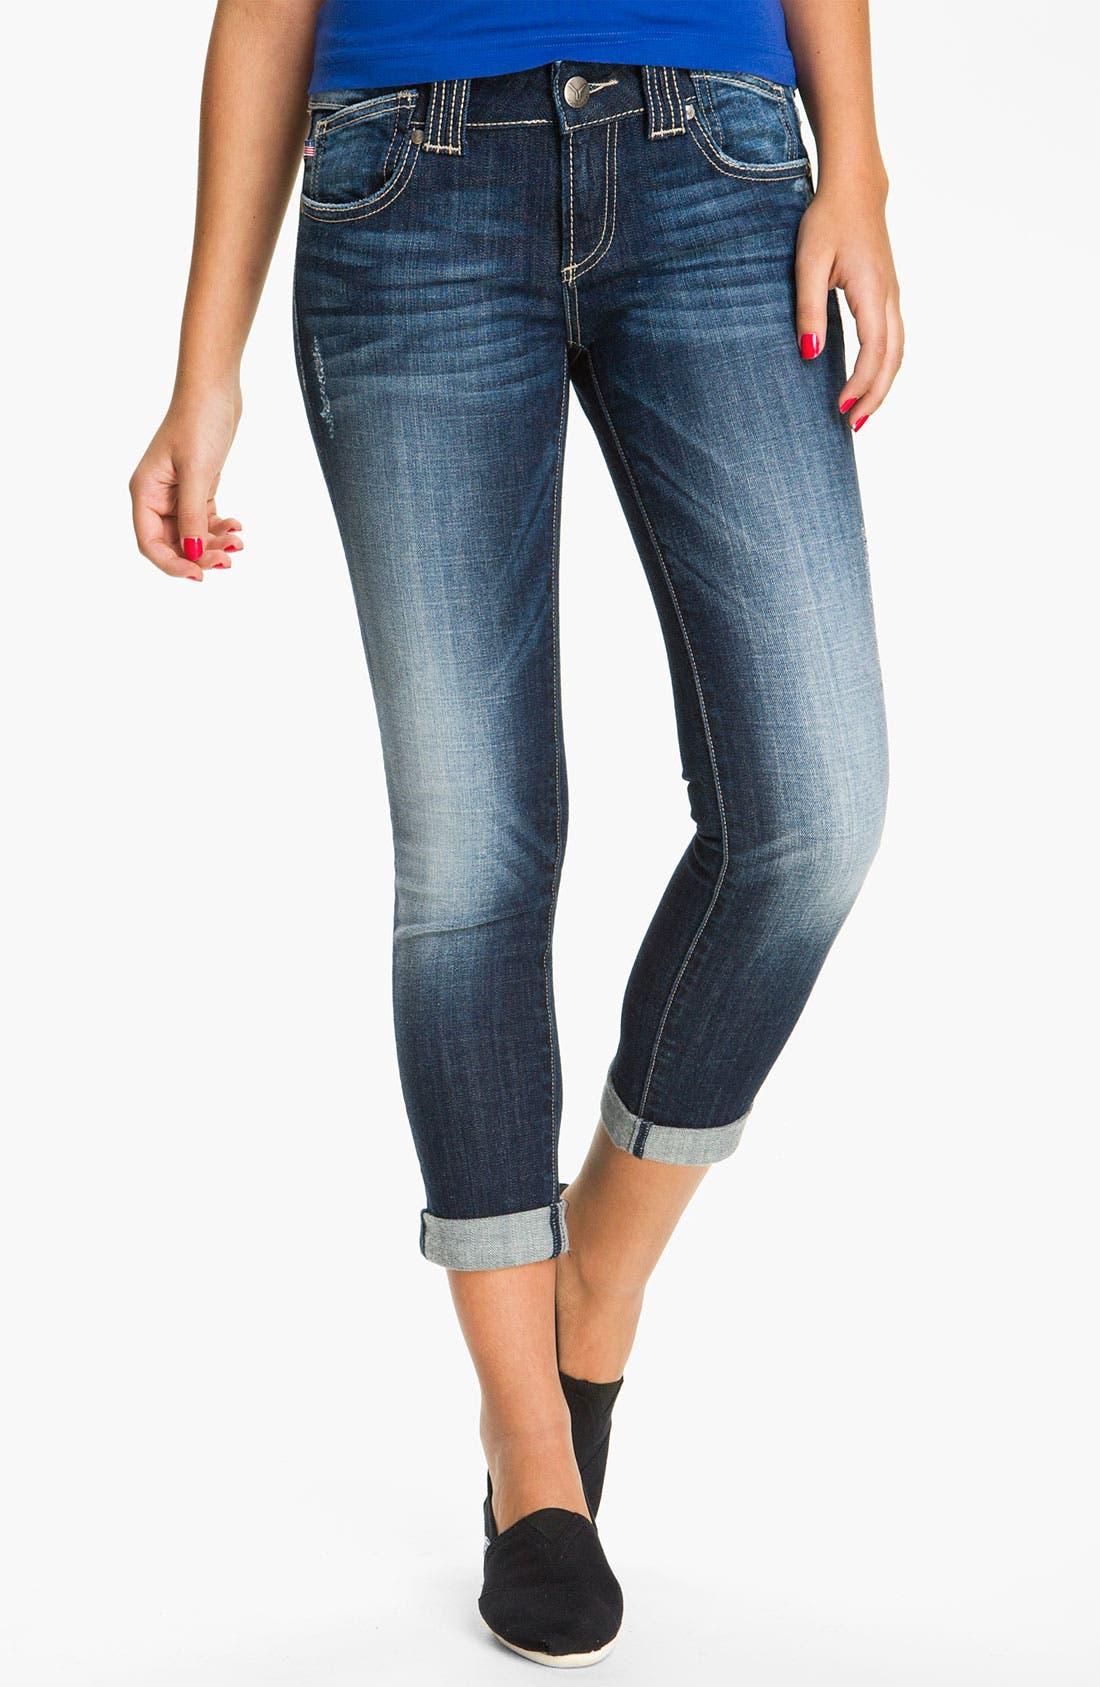 Alternate Image 2  - Vigoss 'Thompson' Stretch Jeans (Dark) (Juniors)